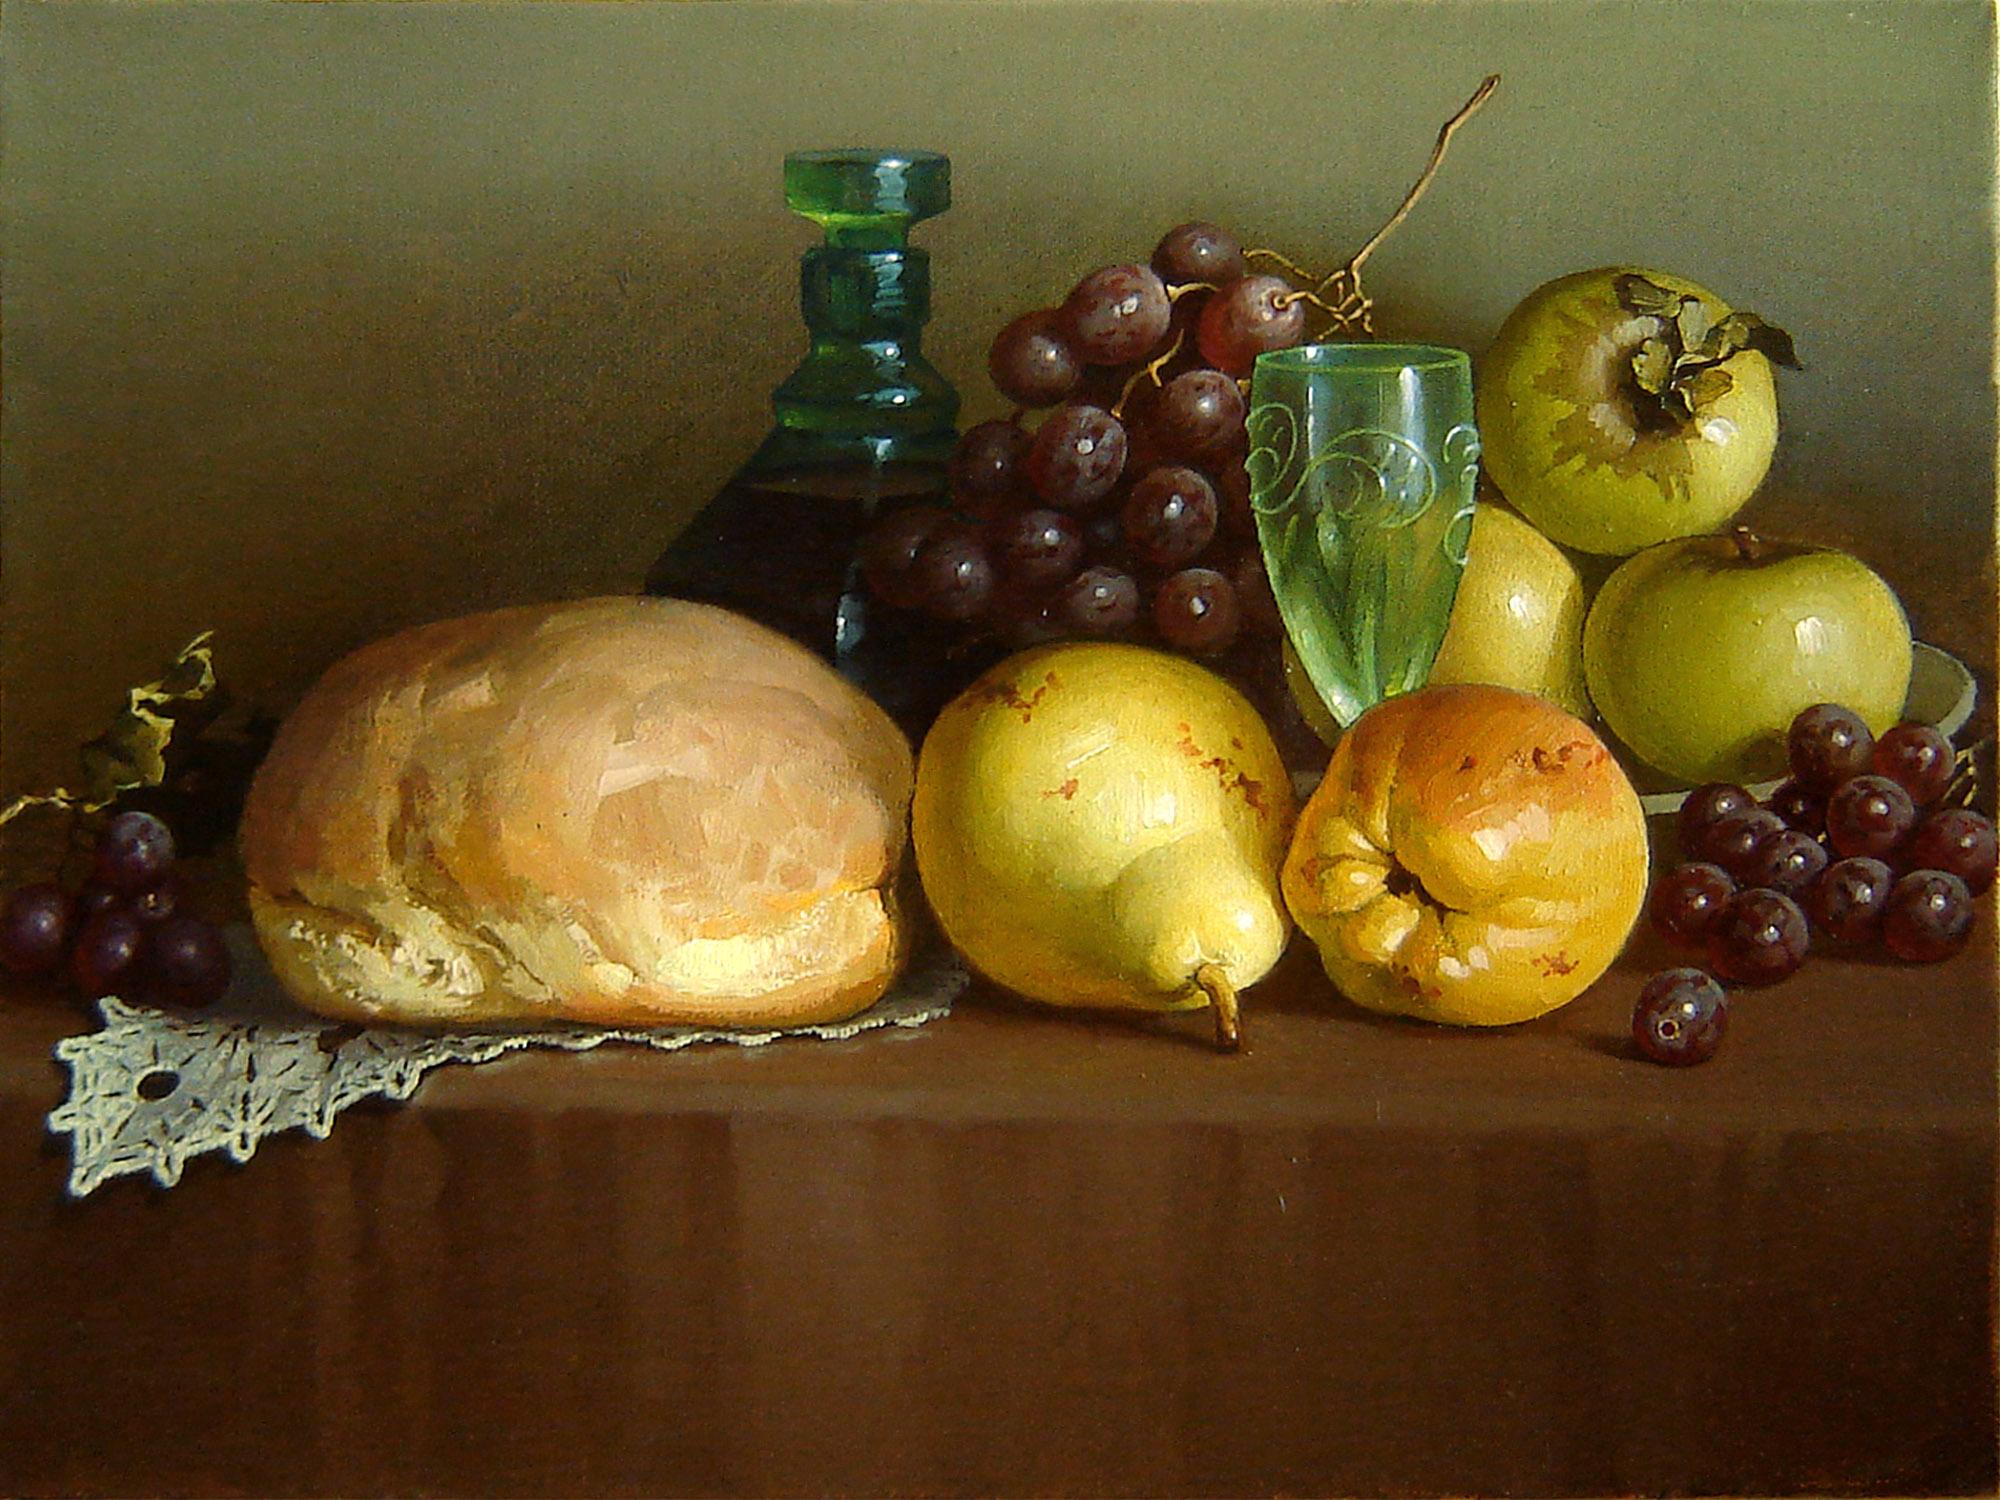 Still life with fruits - PSteam - Artwork Celeste Network